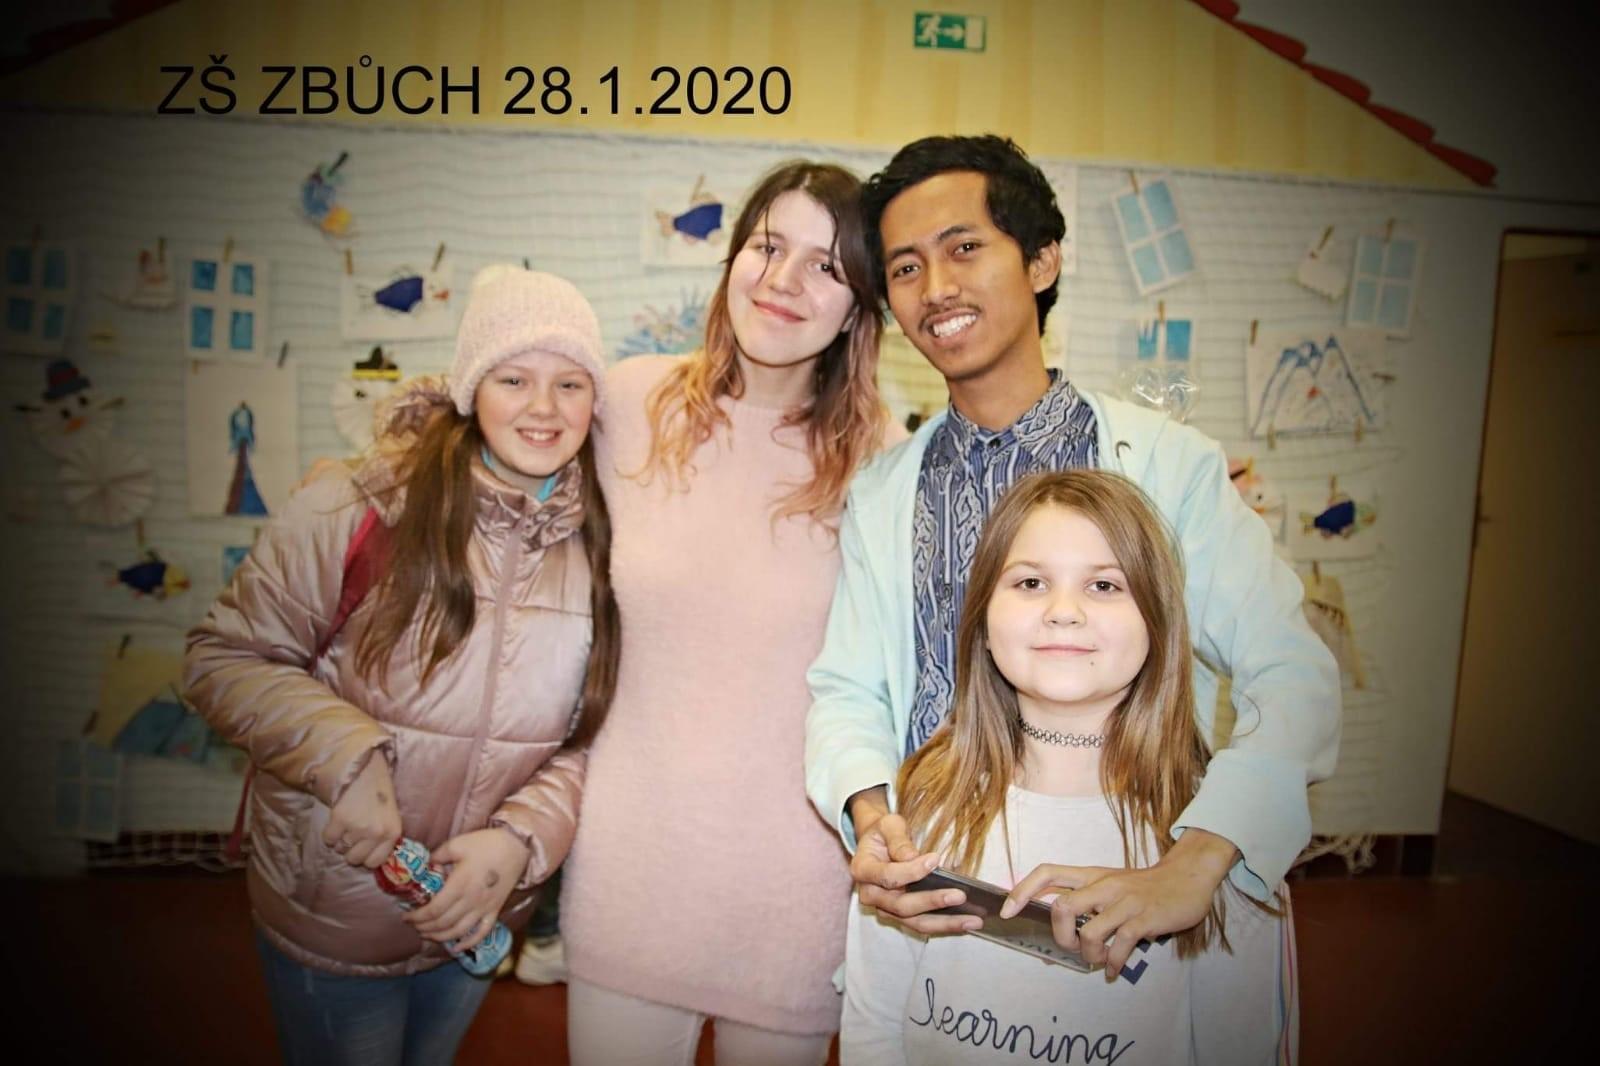 Saya bersama si gadis Serbia, si anak ceria berusia 10 tahun (kiri saya) beserta kawannya (Foto diambil oleh seorang ibu si anak ceria berusia 10 tahun, ia seorang juru masak di sekolah sekaligus seorang fotografer profesional)